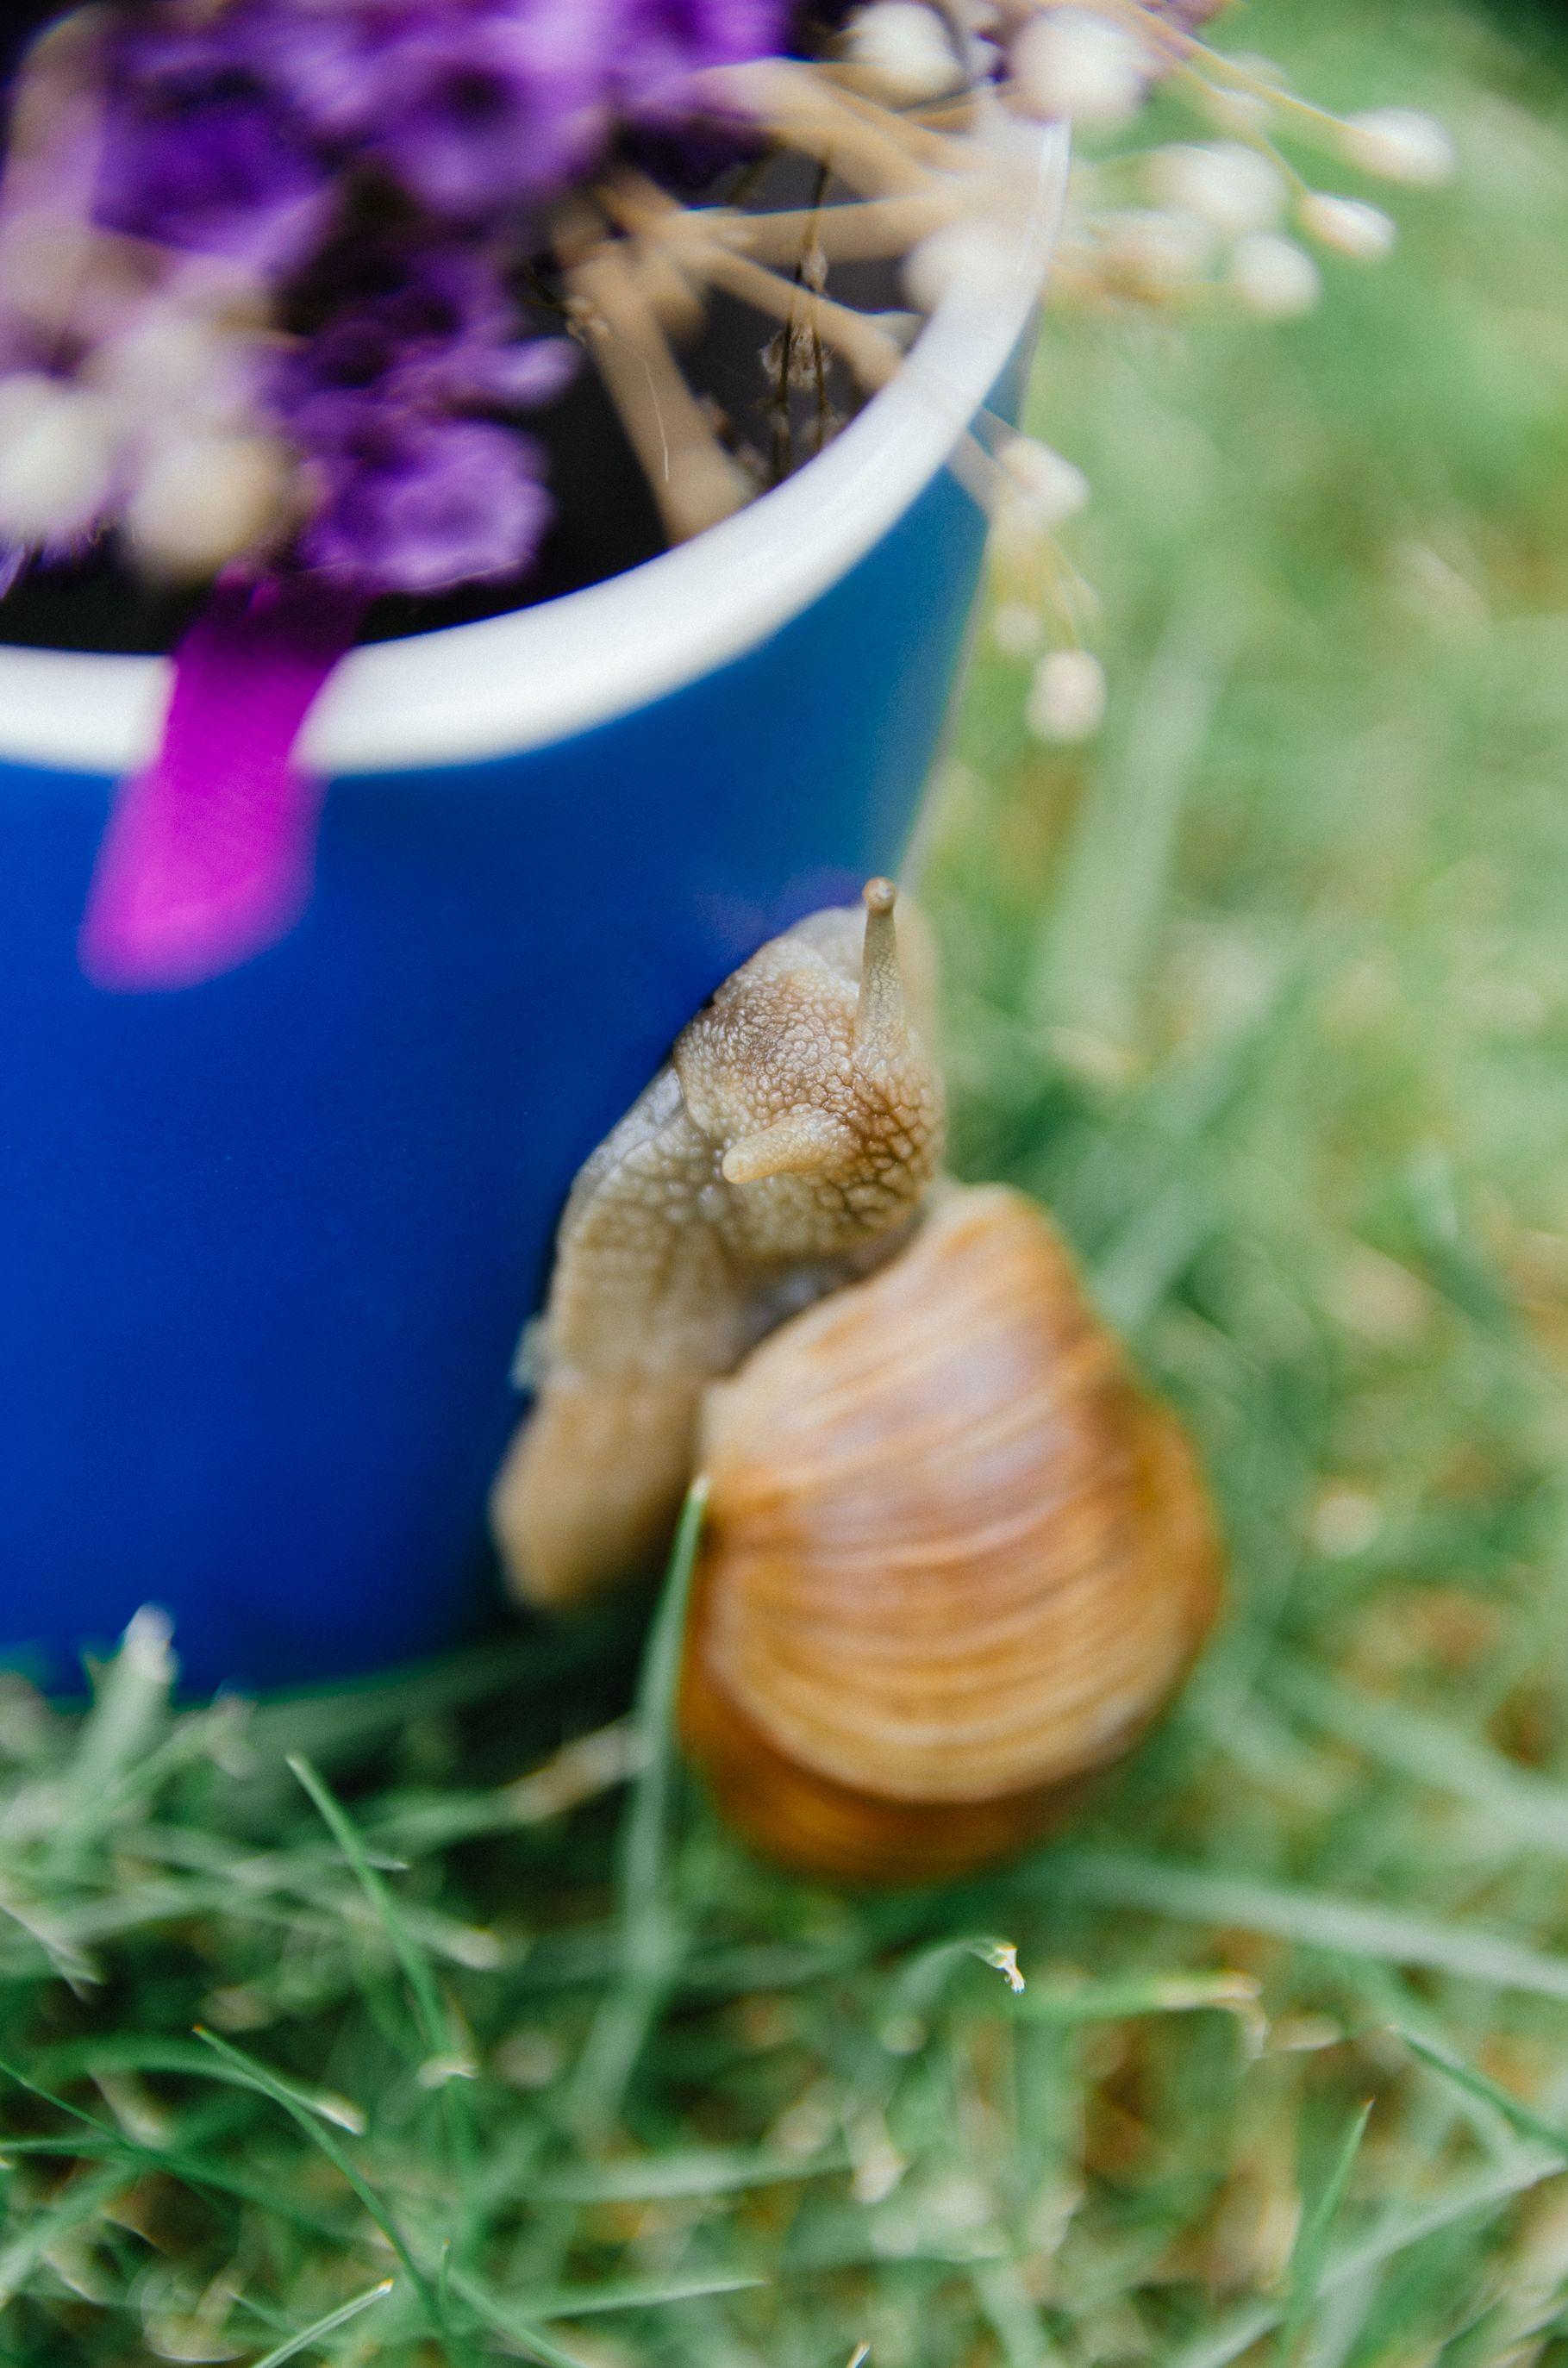 WHAT DO GARDENS SNAILS EAT? Garden snails (Helix Pomatia